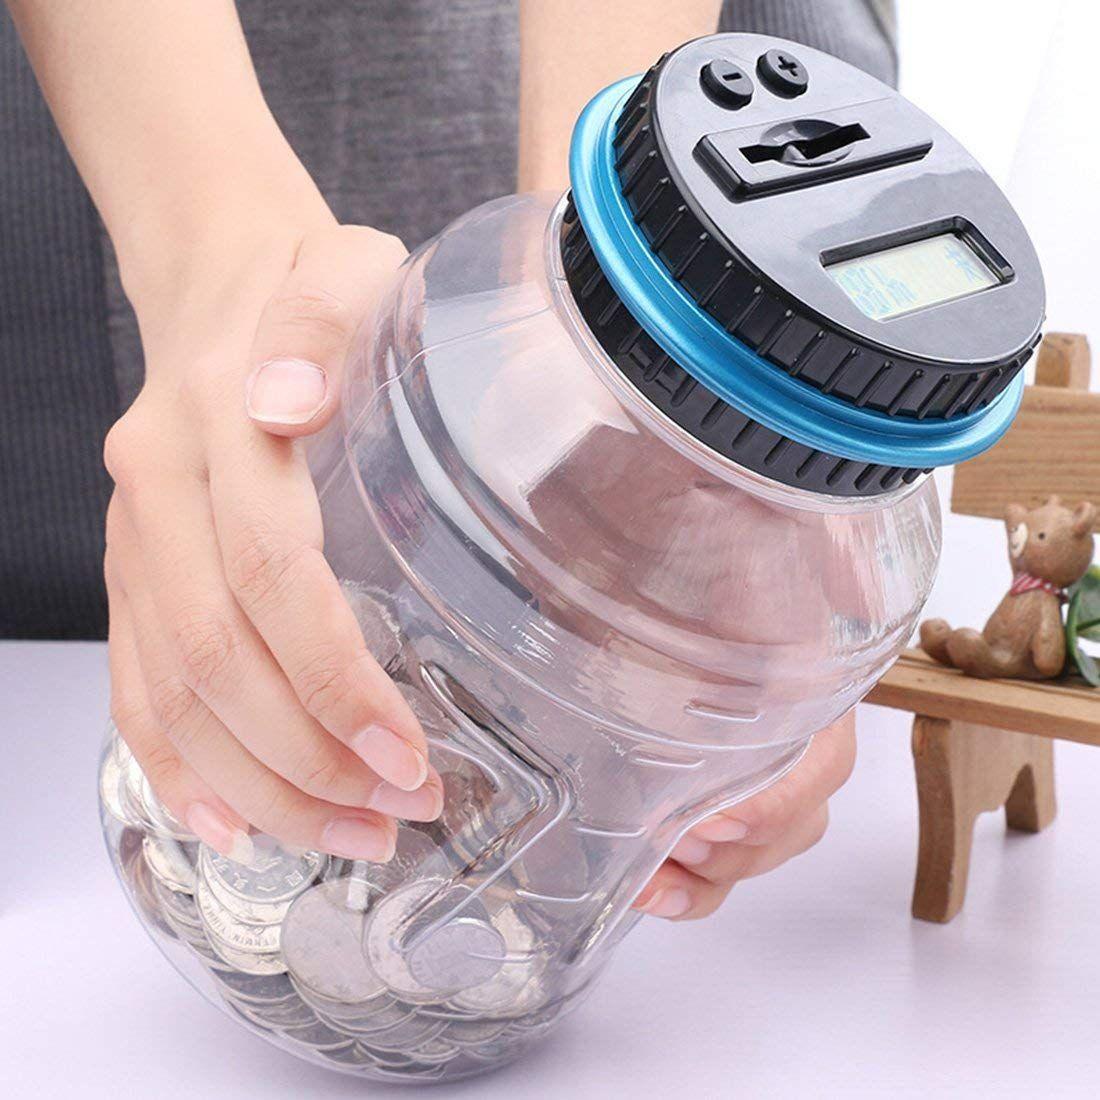 Abluea Piggy Bank Digital Automatic Counting Coin Bank Jar